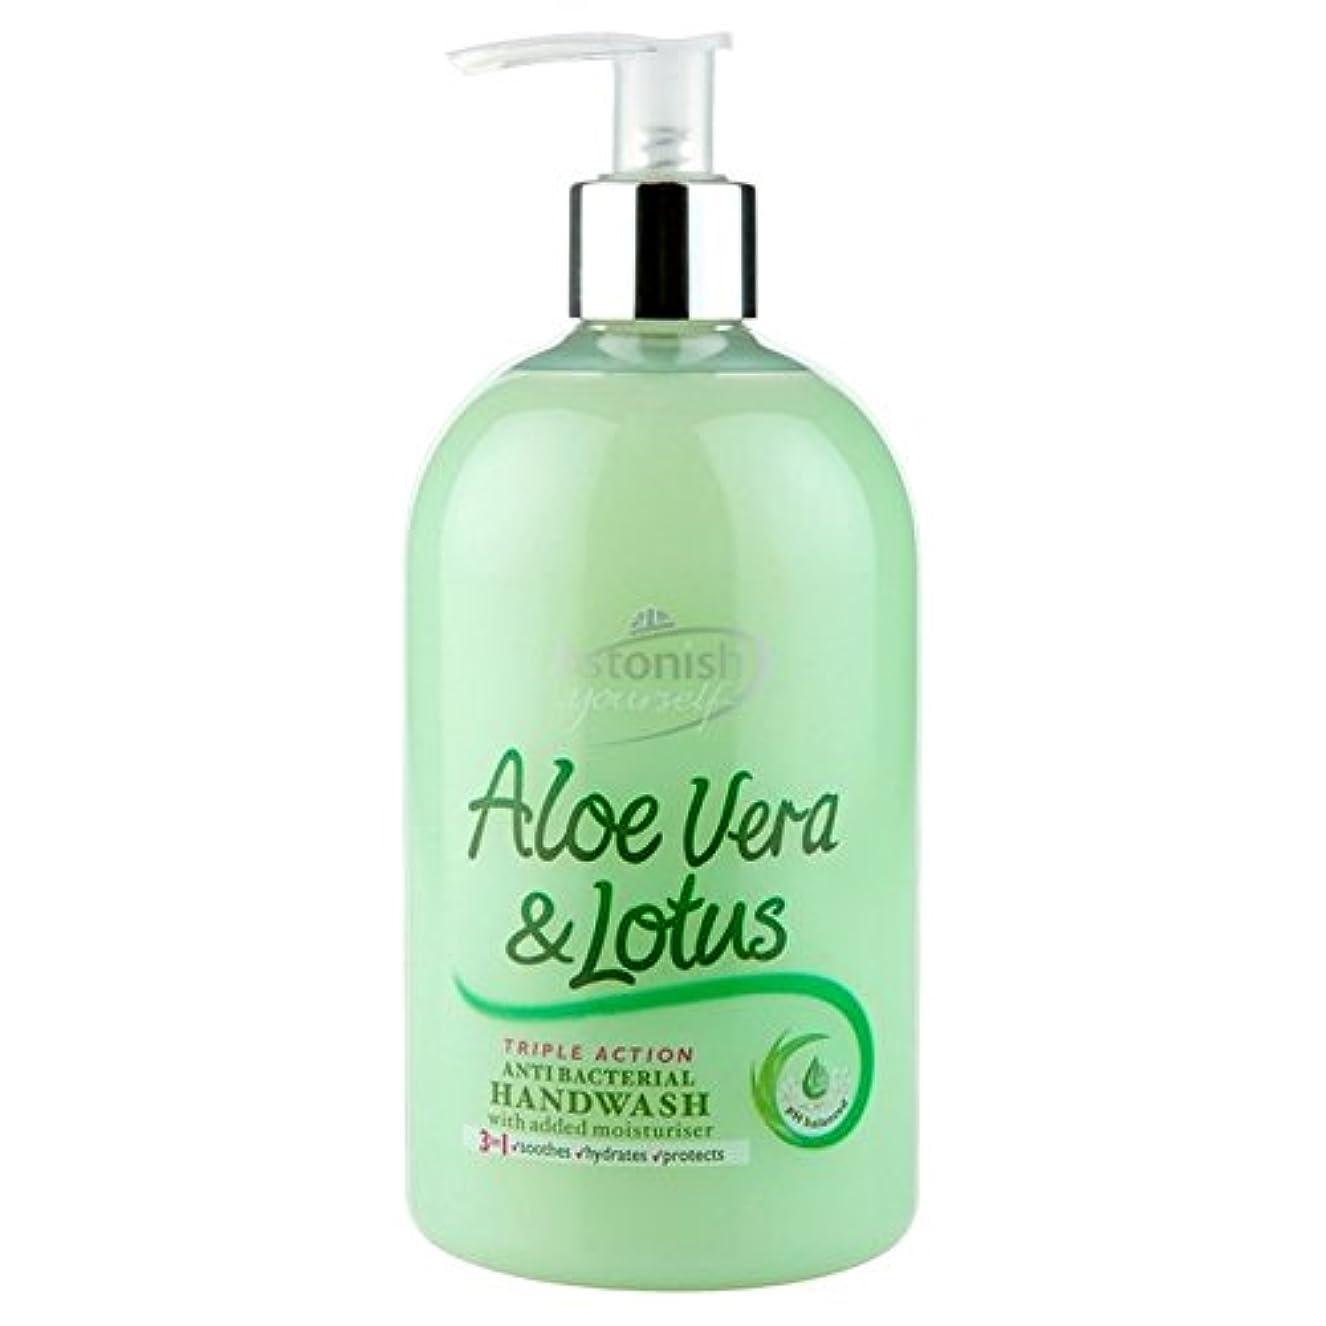 Astonish Aloe Vera & Lotus Anti Bacterial Hand Wash 500ml (Pack of 2) - (Astonish) アロエベラ&蓮抗細菌手洗いの500ミリリットル (x2...